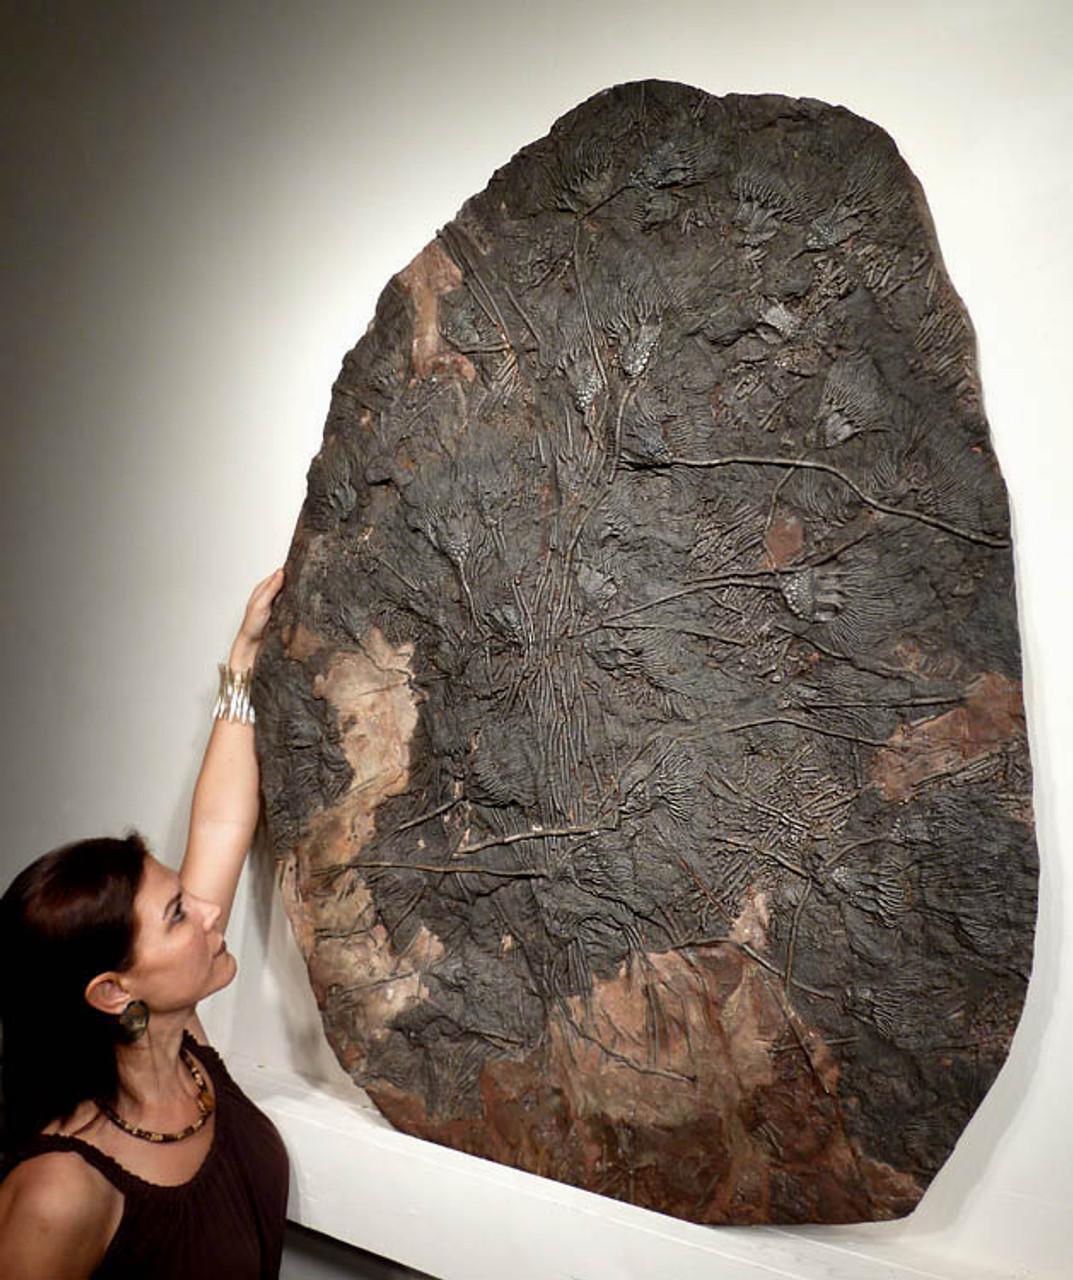 jewelleryartscraftslapidaryfossil collecting. 6 Large Pieces of Scottish Fossil Sea LilyCrinoid Carboniferous era 3 million years old